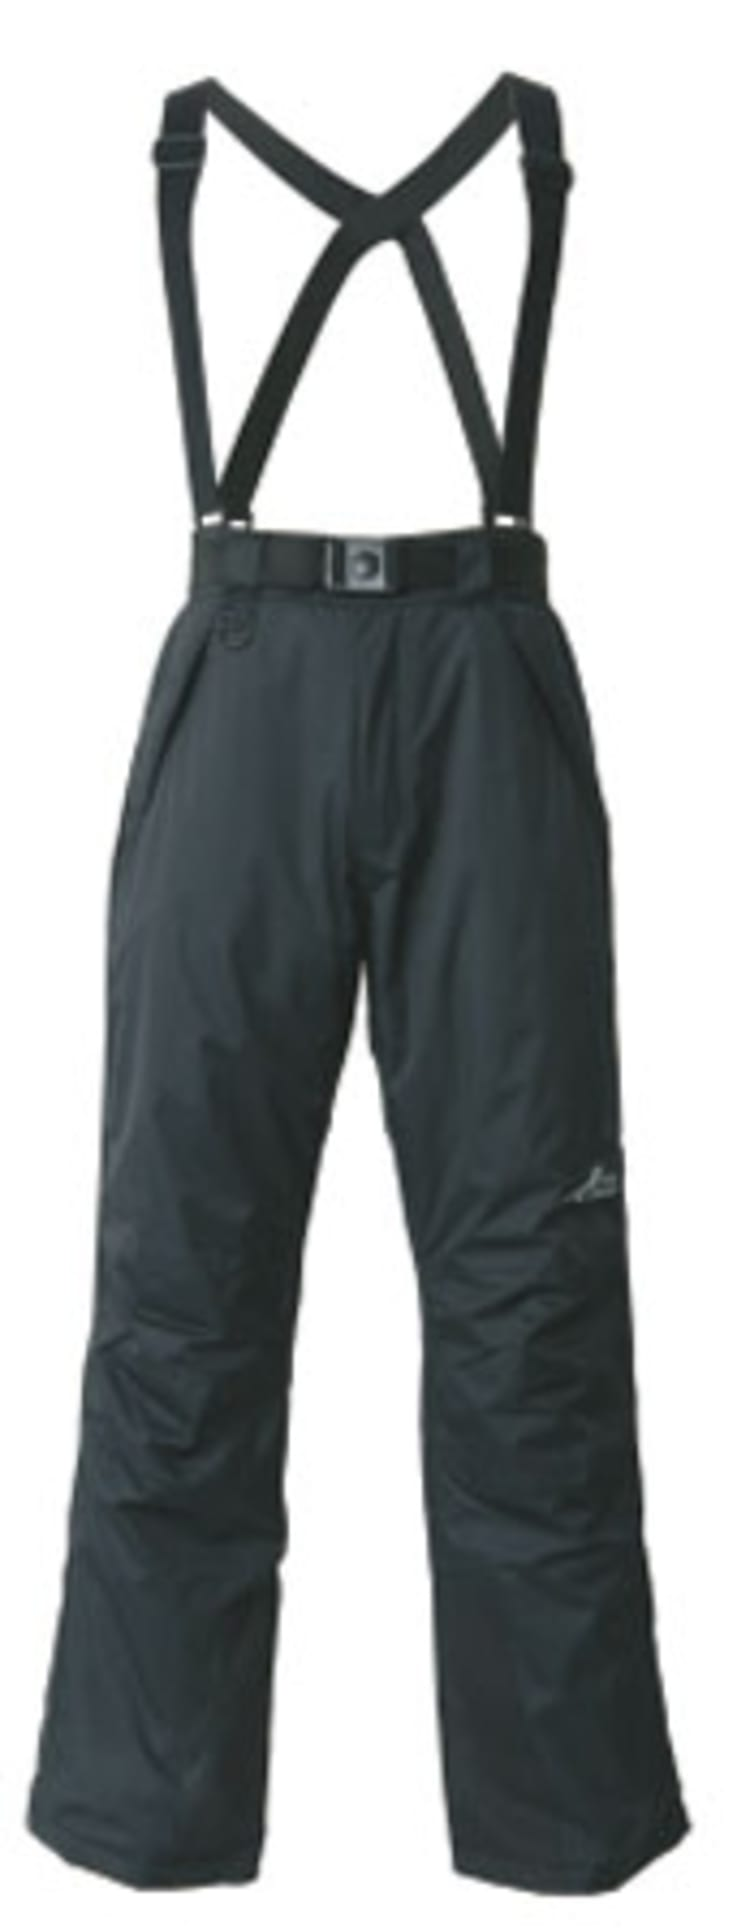 First Ascent Avalanche Ski Trouser - default